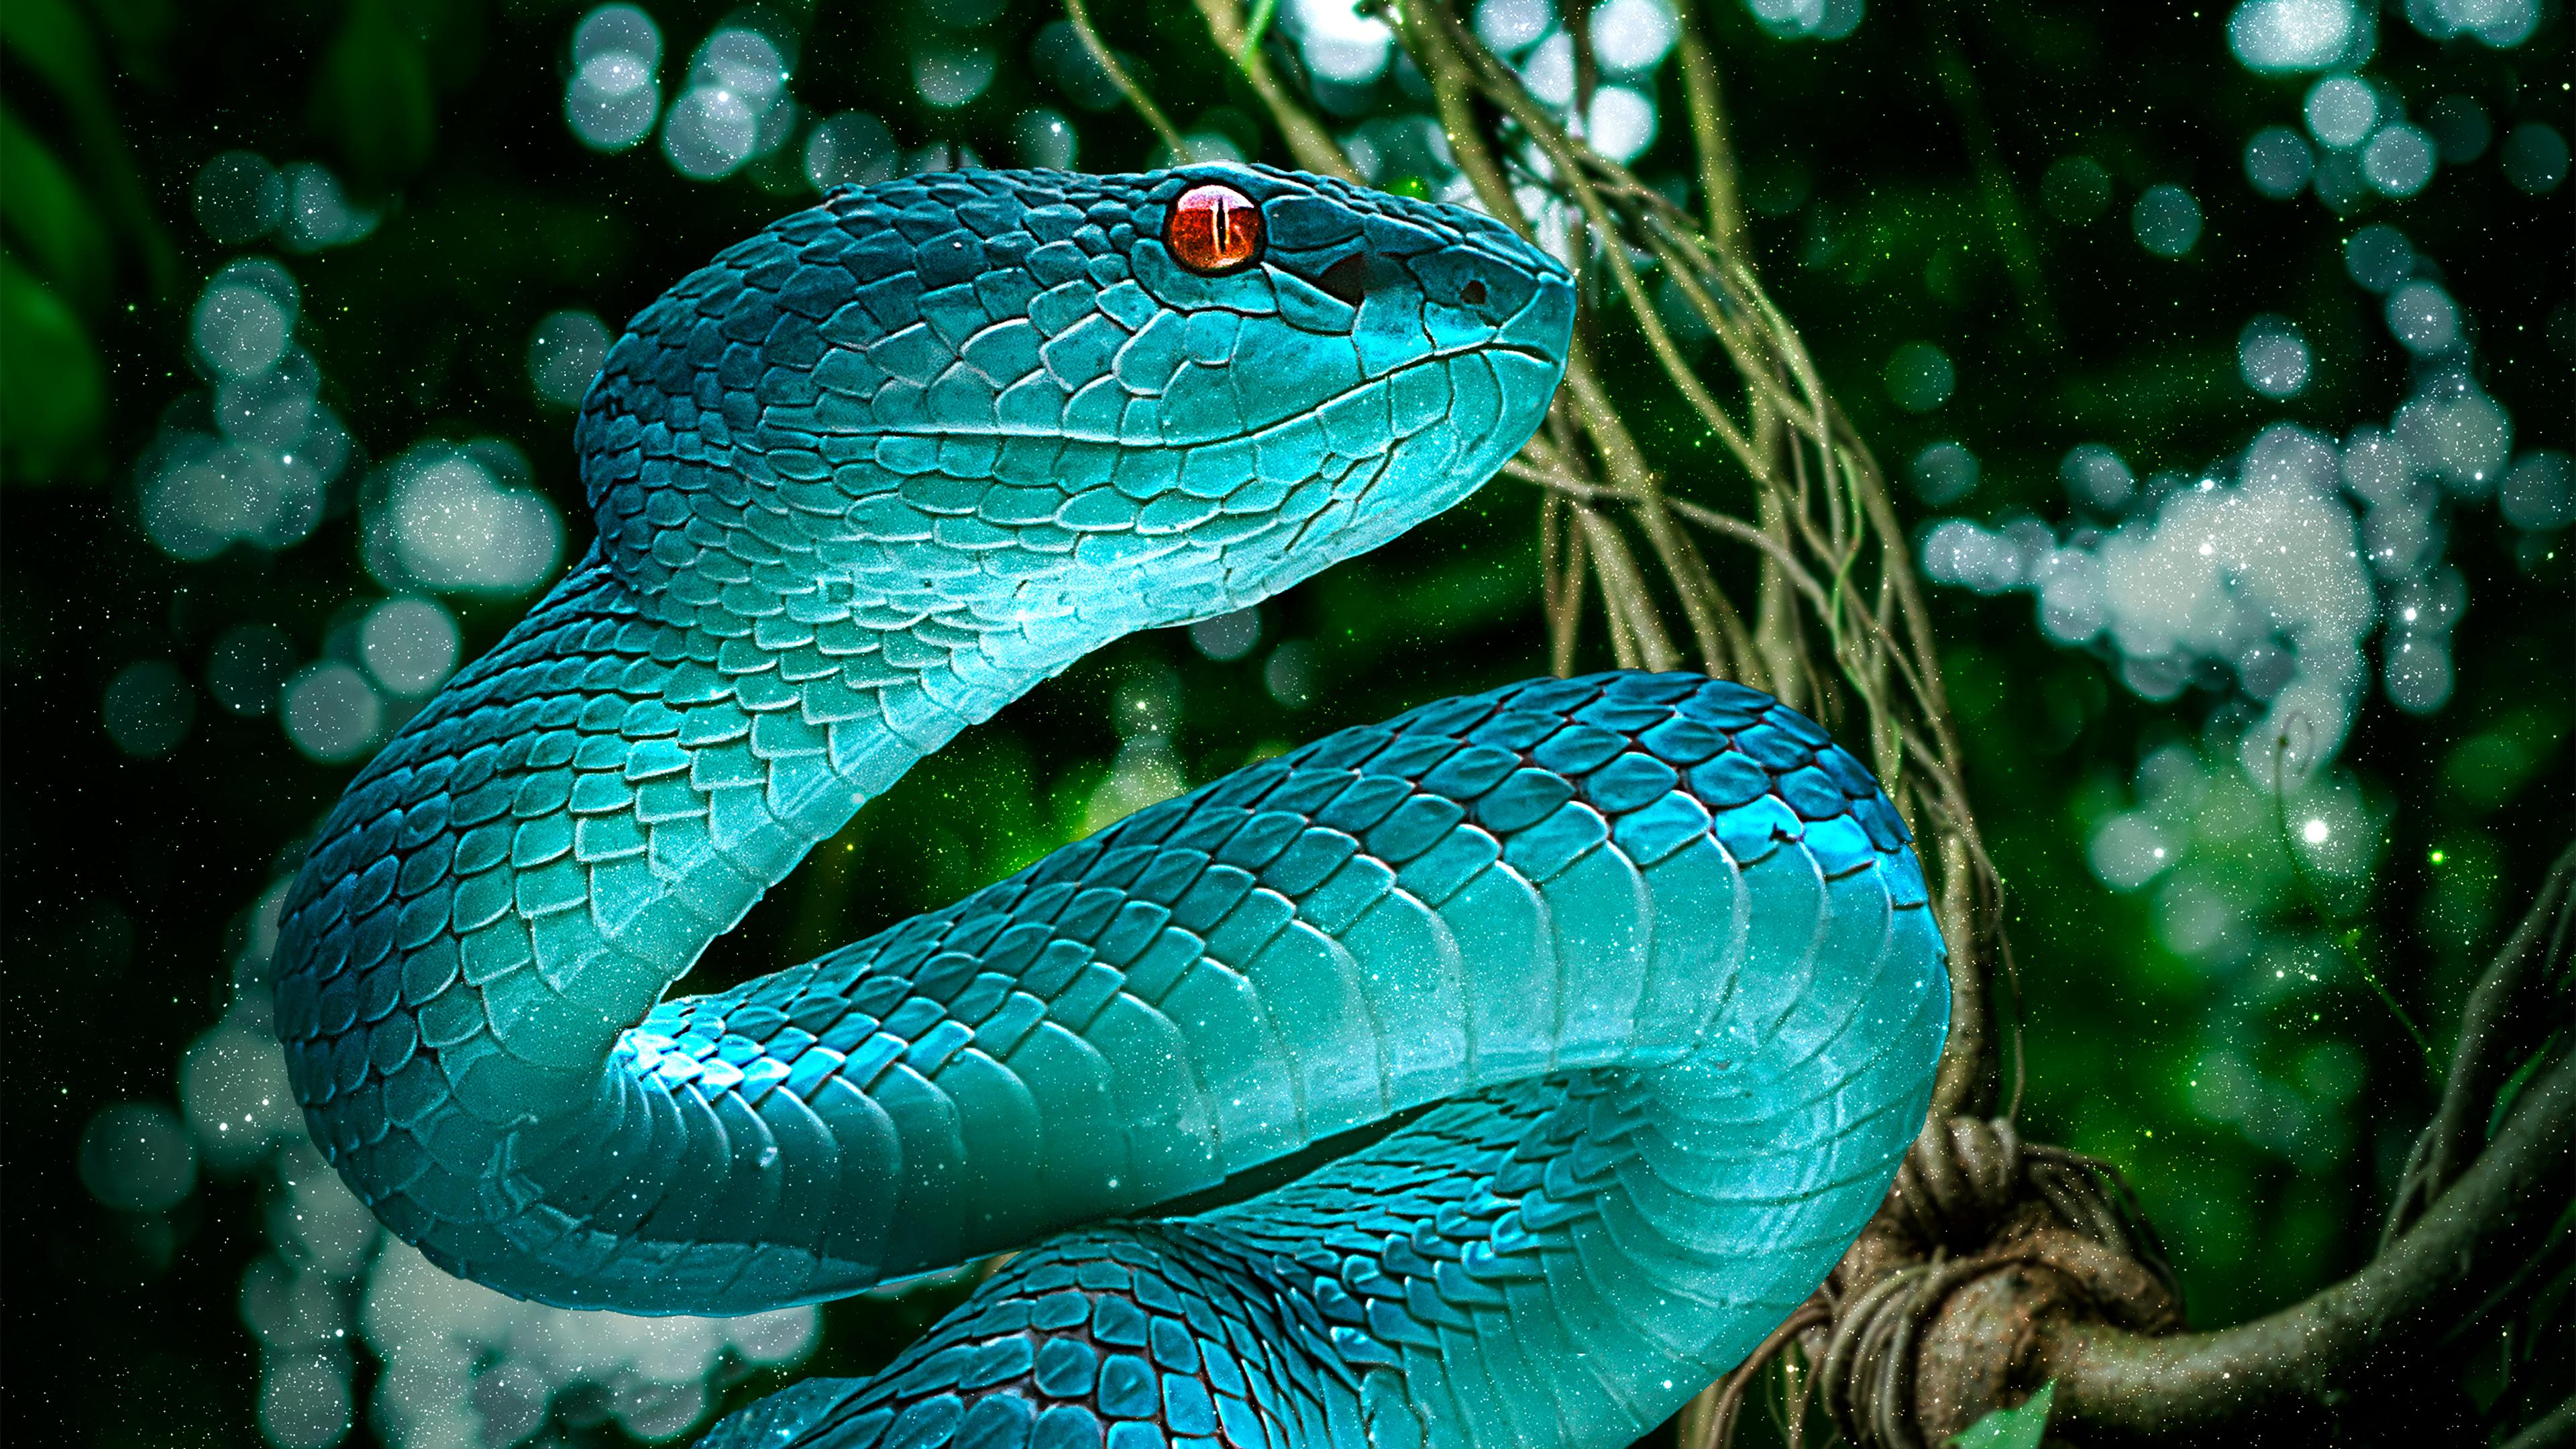 Blue Pit Viper 4k Ultra Hd обои фон 3840x2160 Id